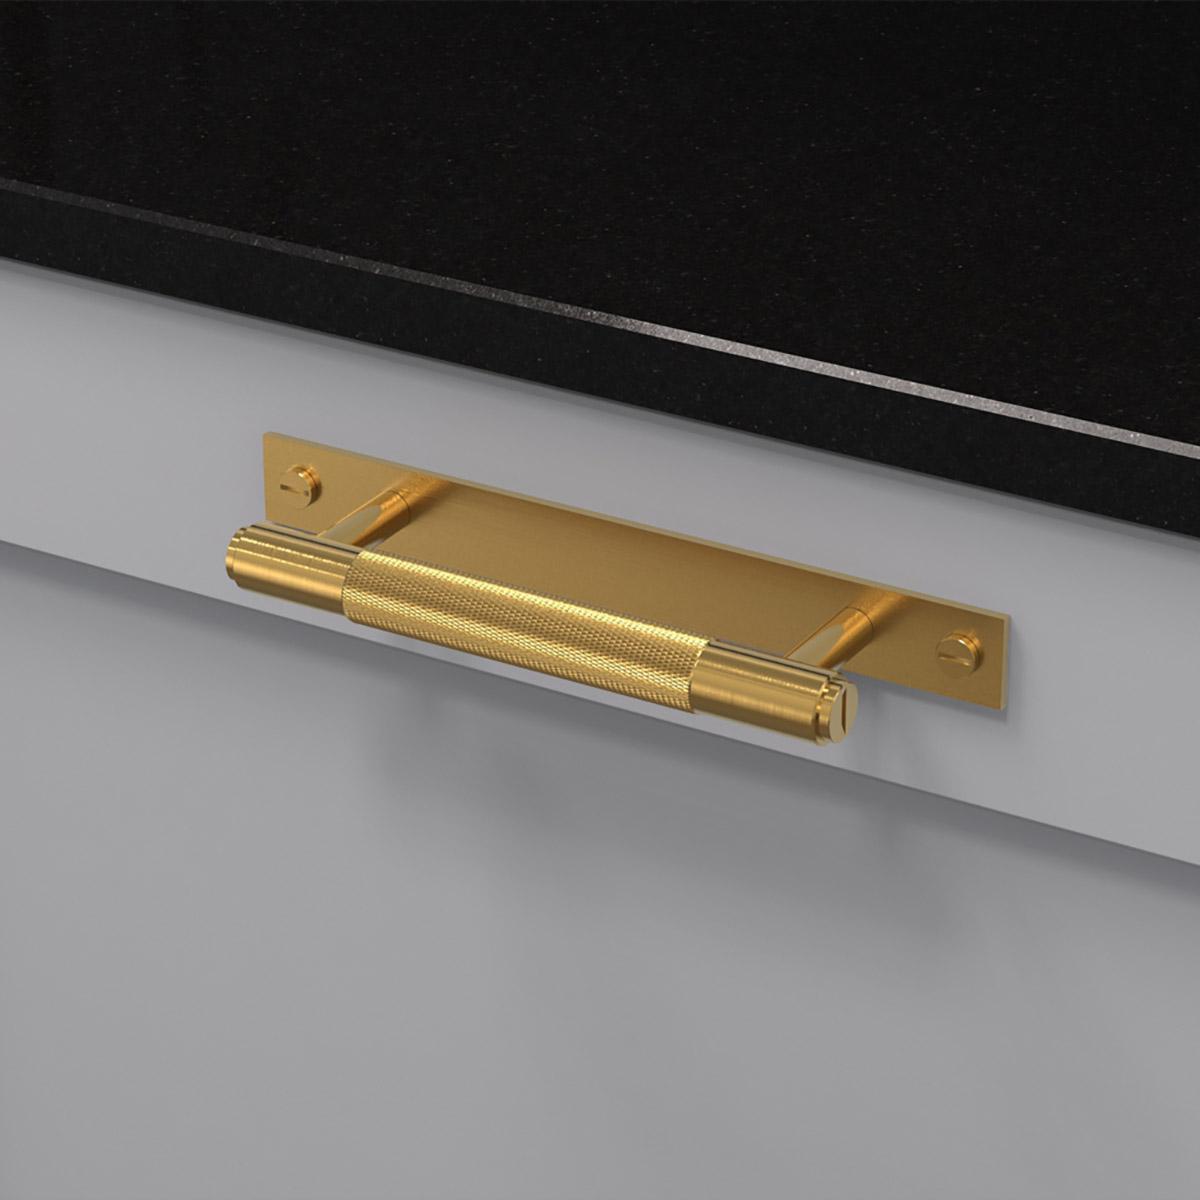 pull bar plate massing uk pb hp 160 br a cc 125 mm ncs s 3000 n granit svart